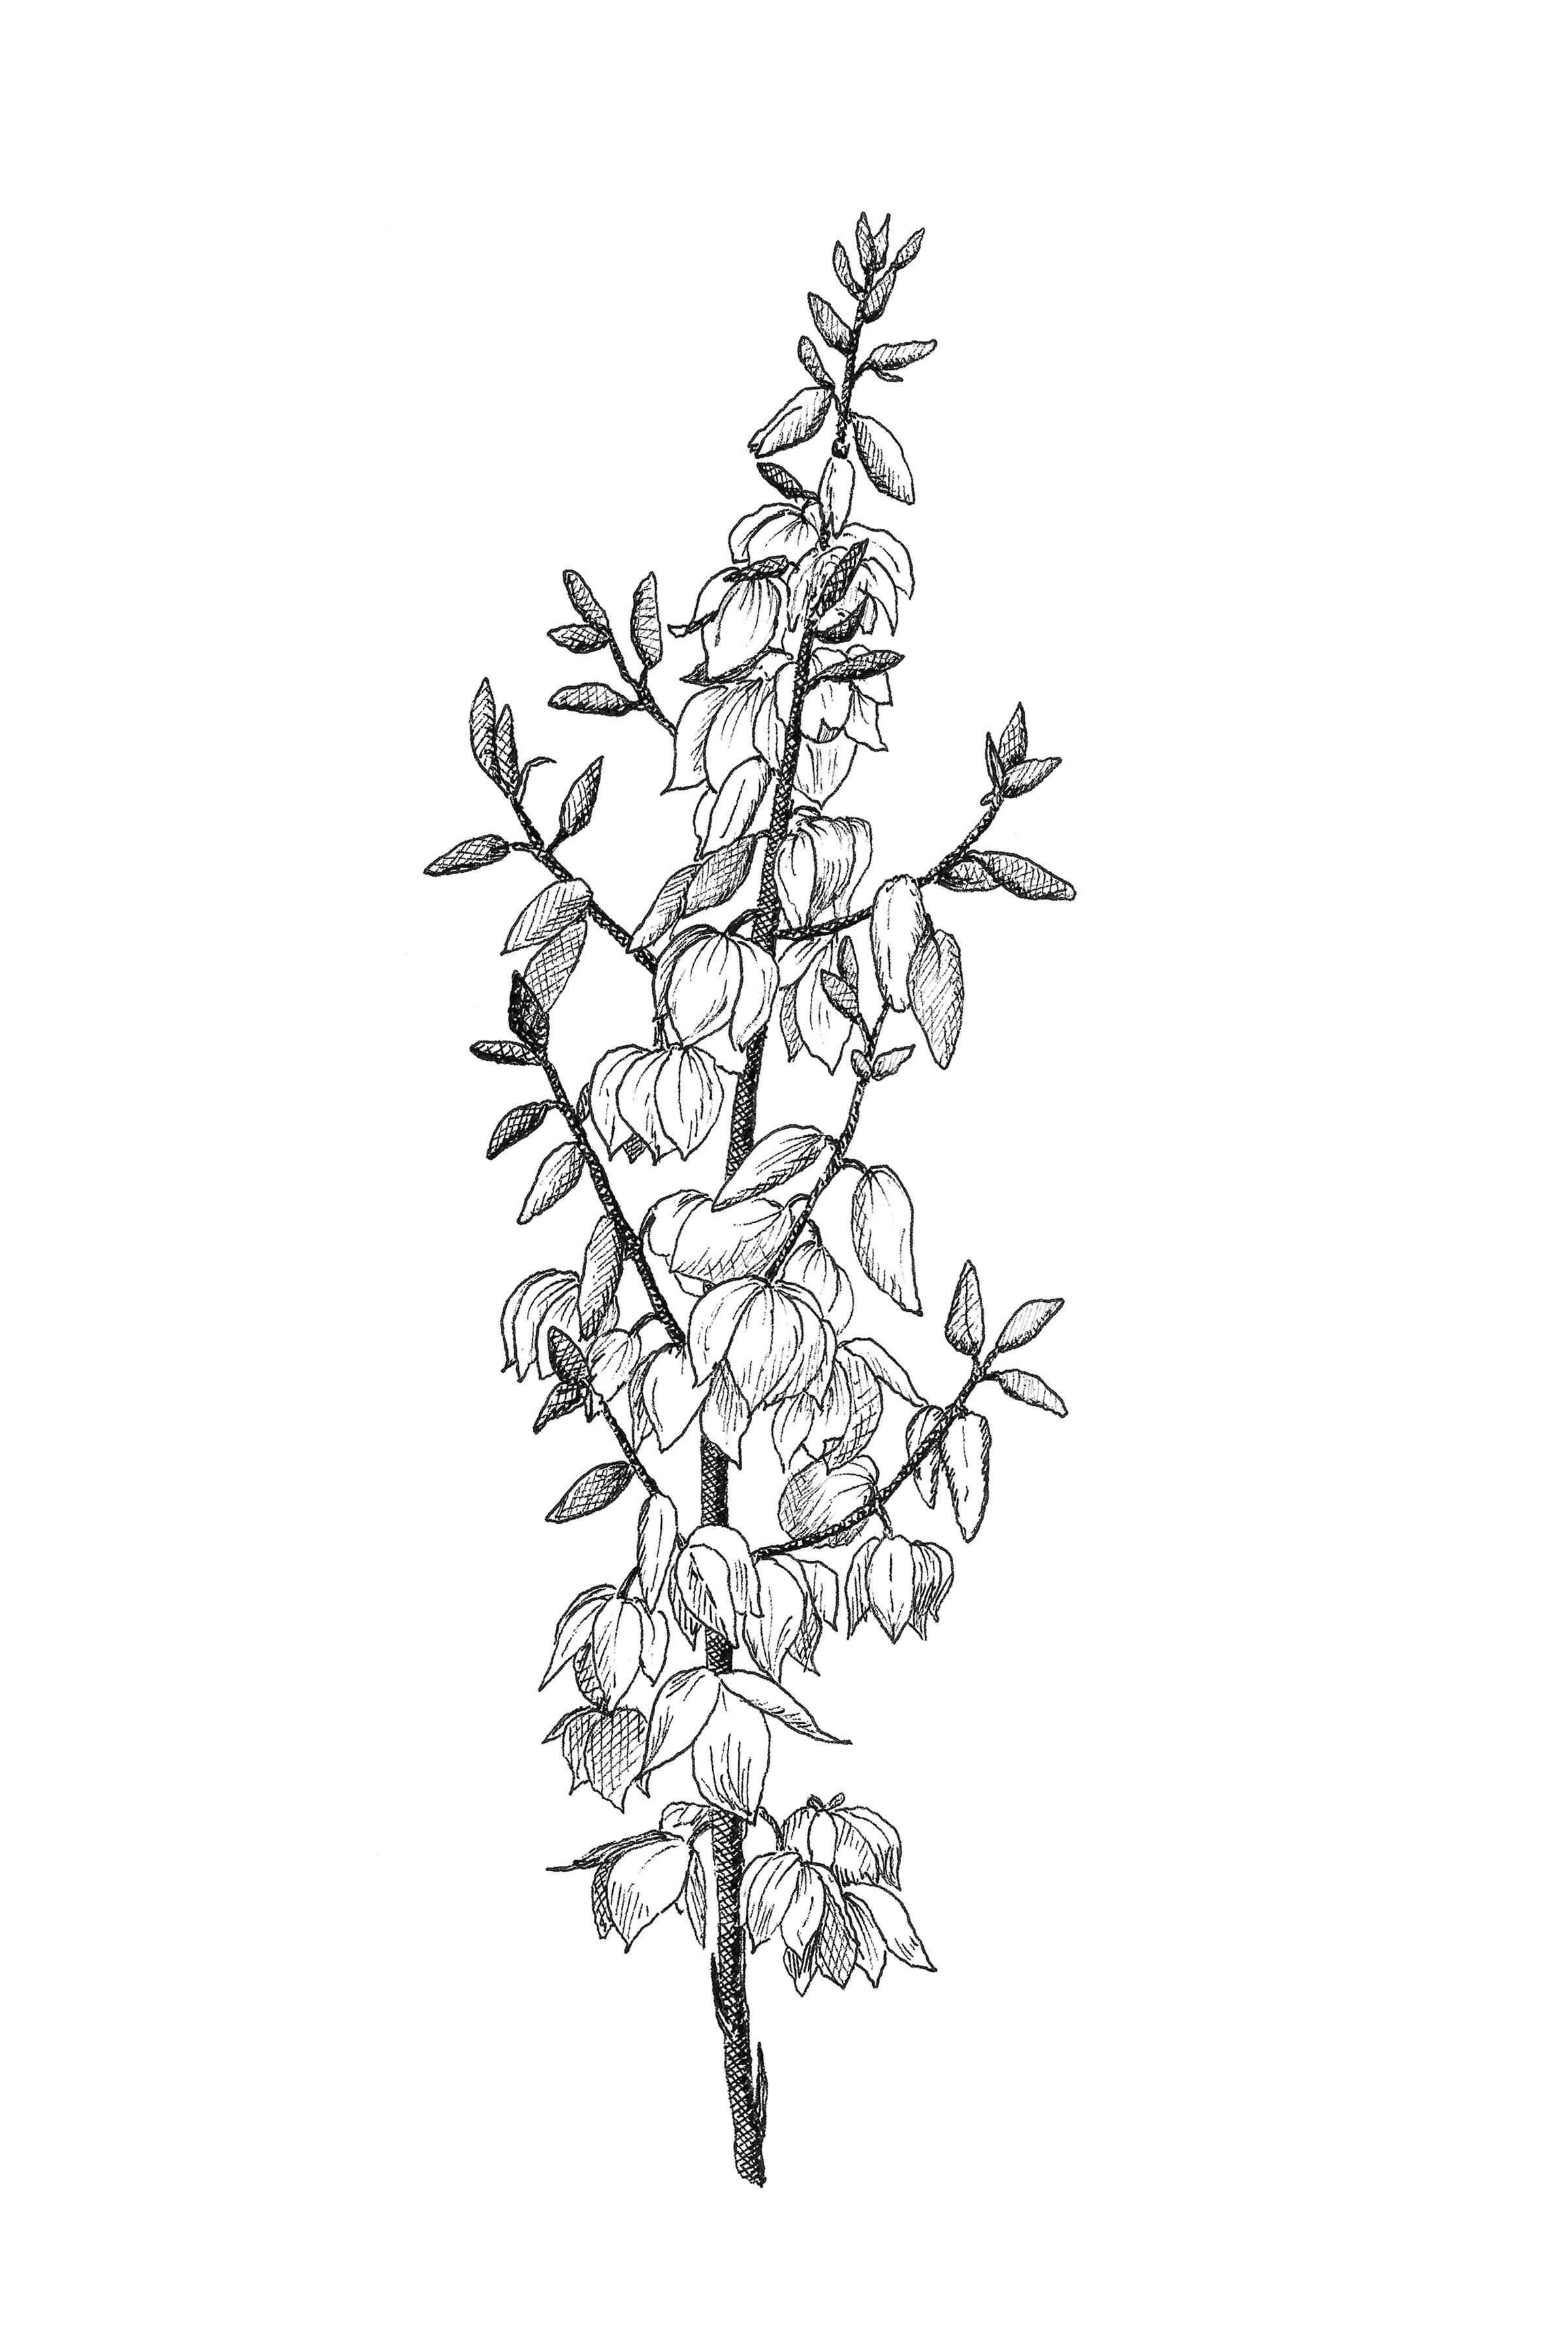 Yucca Flower Botanical Print Botanical Wall Art Black And White Yucca Printable New Mexico State Flower In 2020 Wildflower Tattoo Botanical Prints New Mexico Tattoo